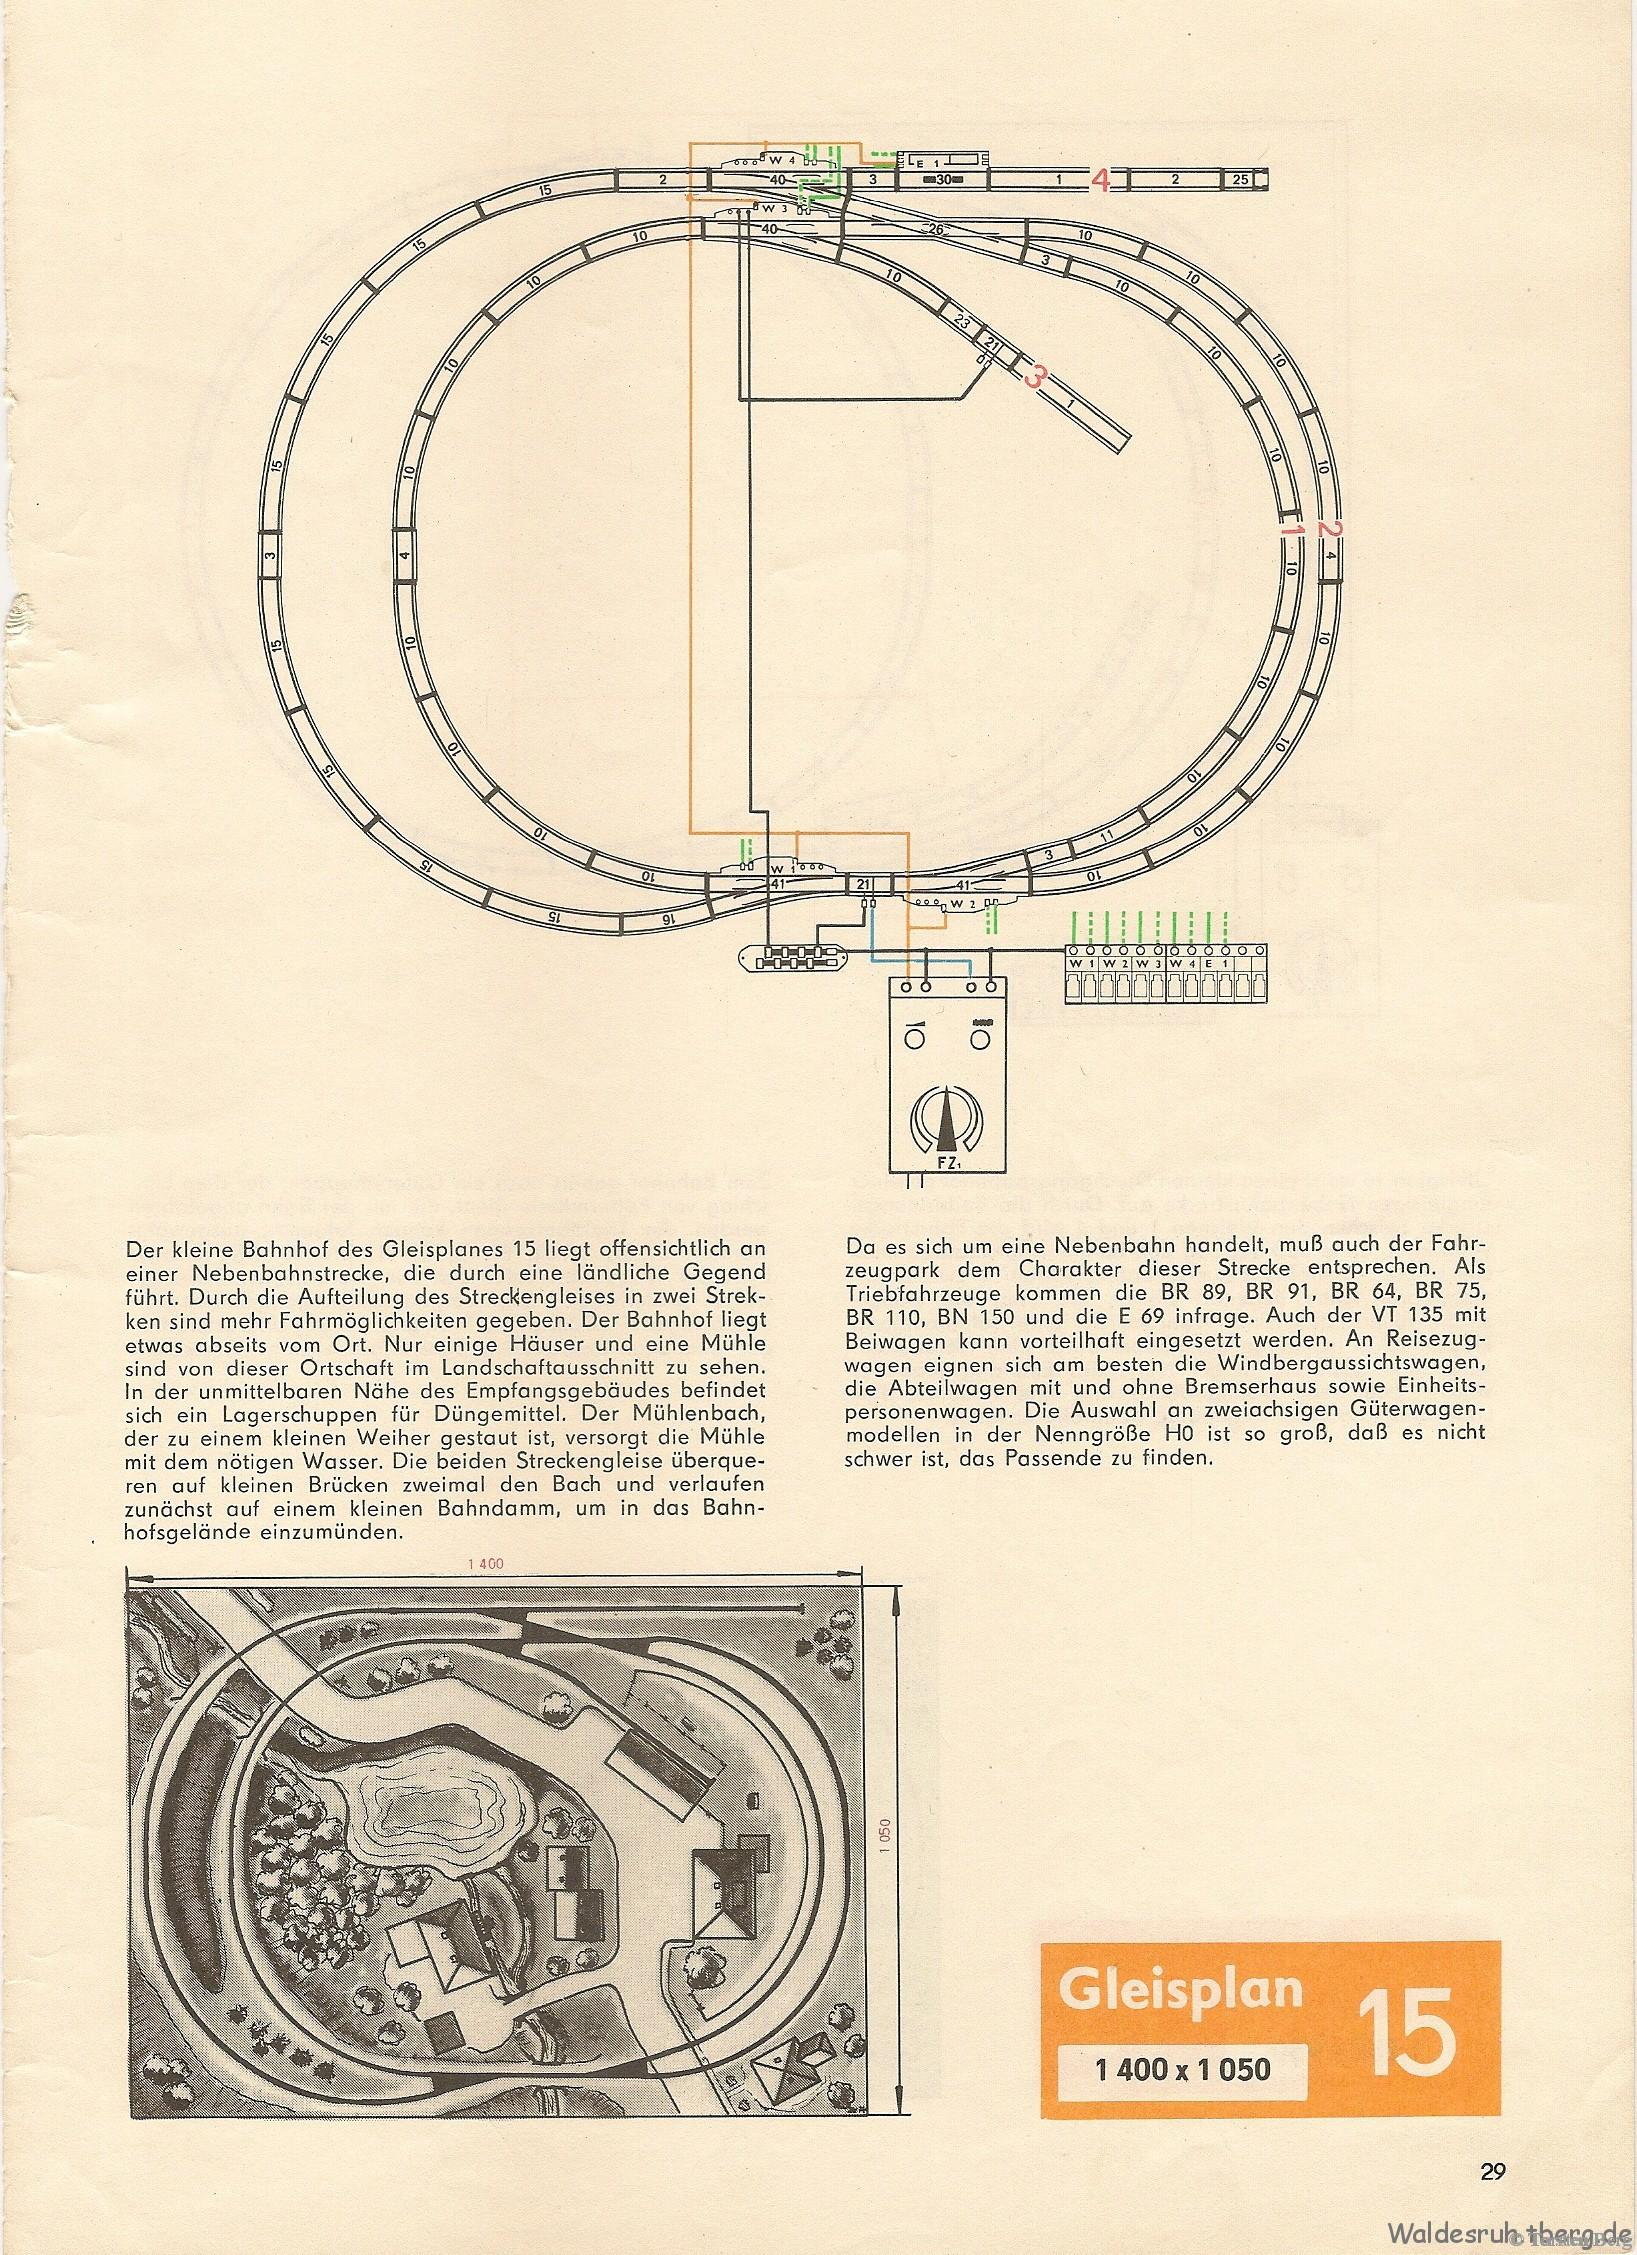 30 PIKO Standardgleis-Gleisplan 15